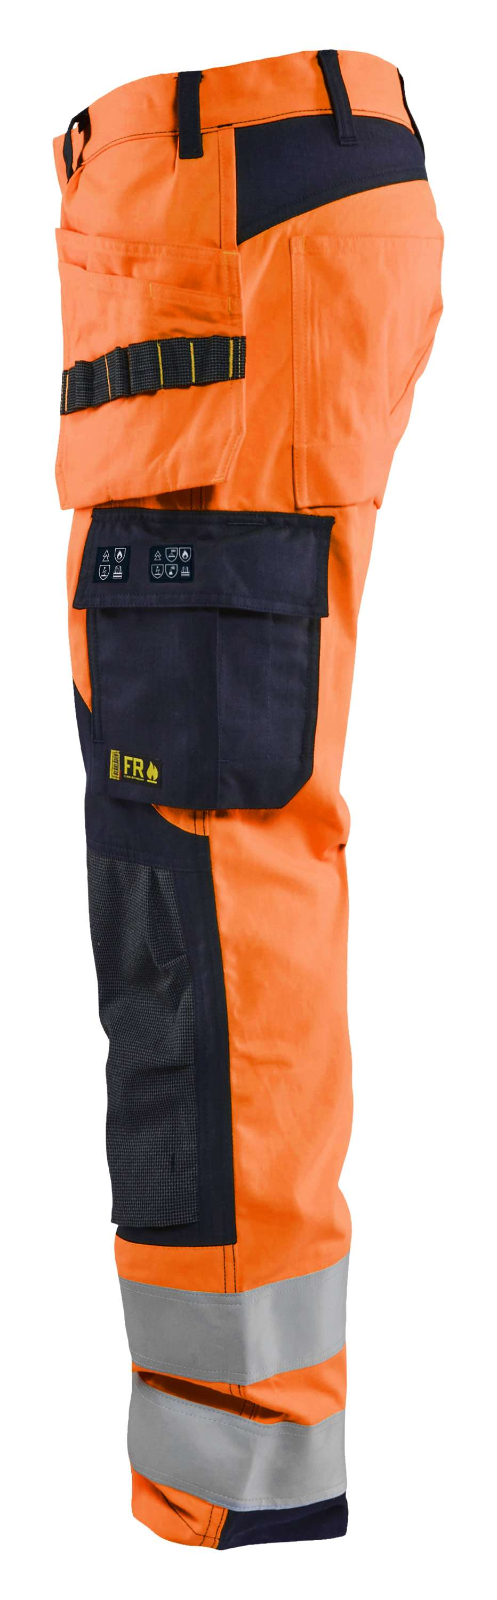 Blaklader Broeken 15891513 Multinorm fluo oranje-marineblauw(5389)